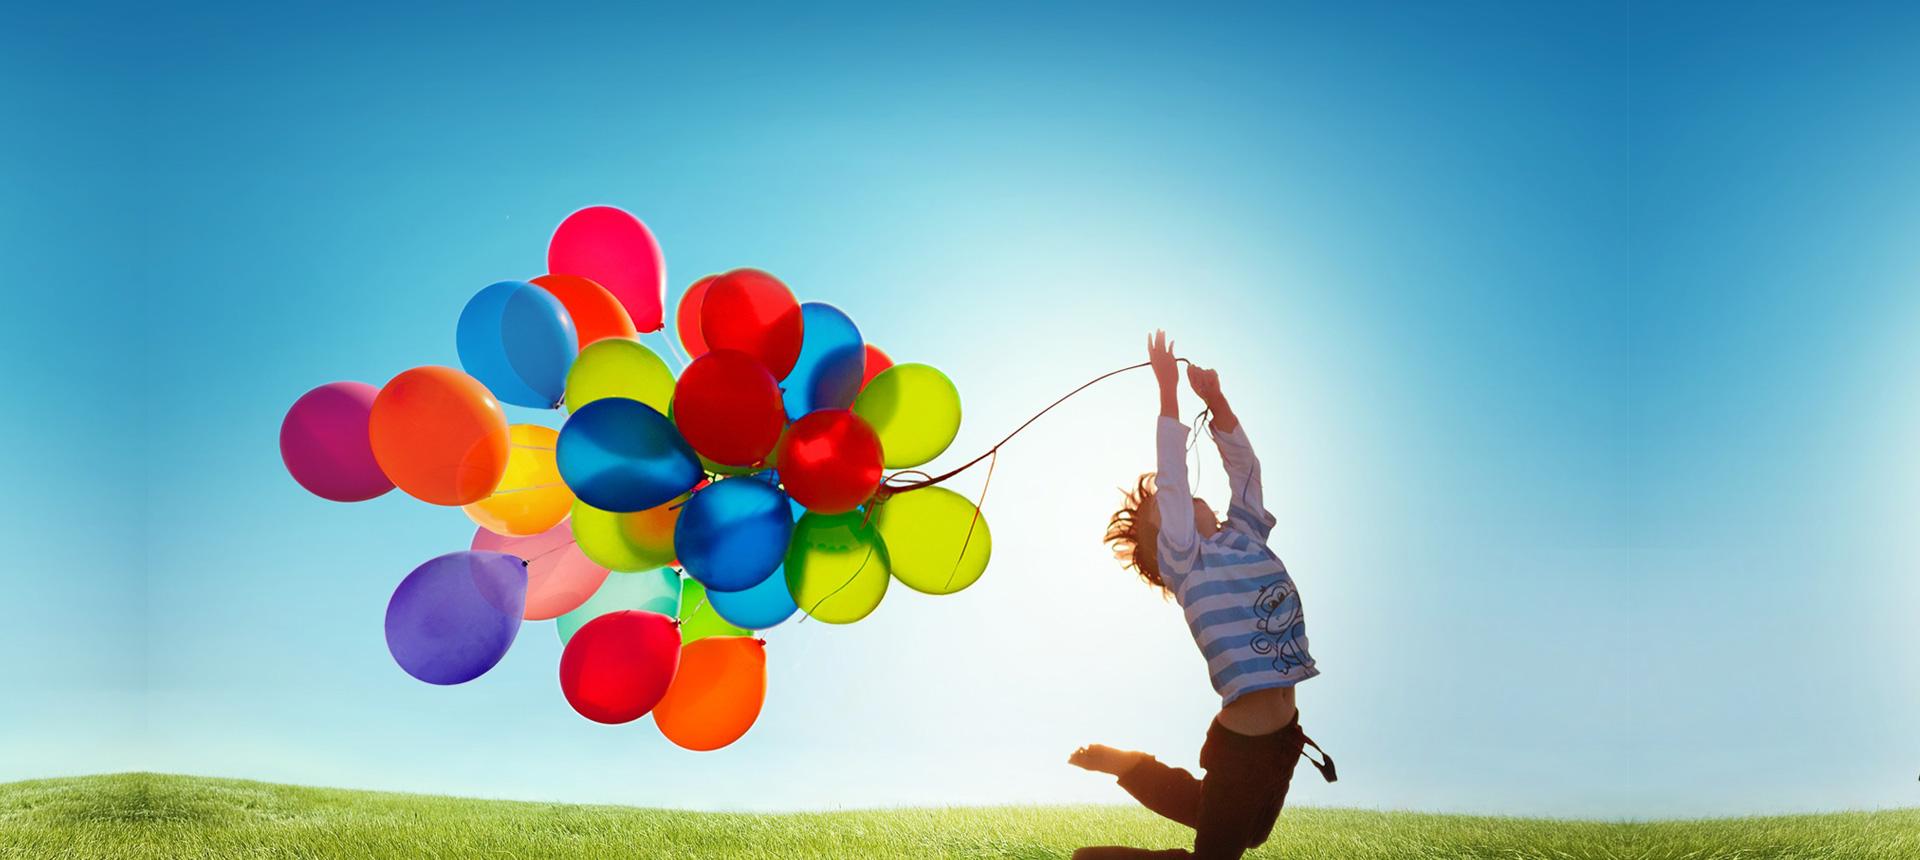 Jump_baloon4